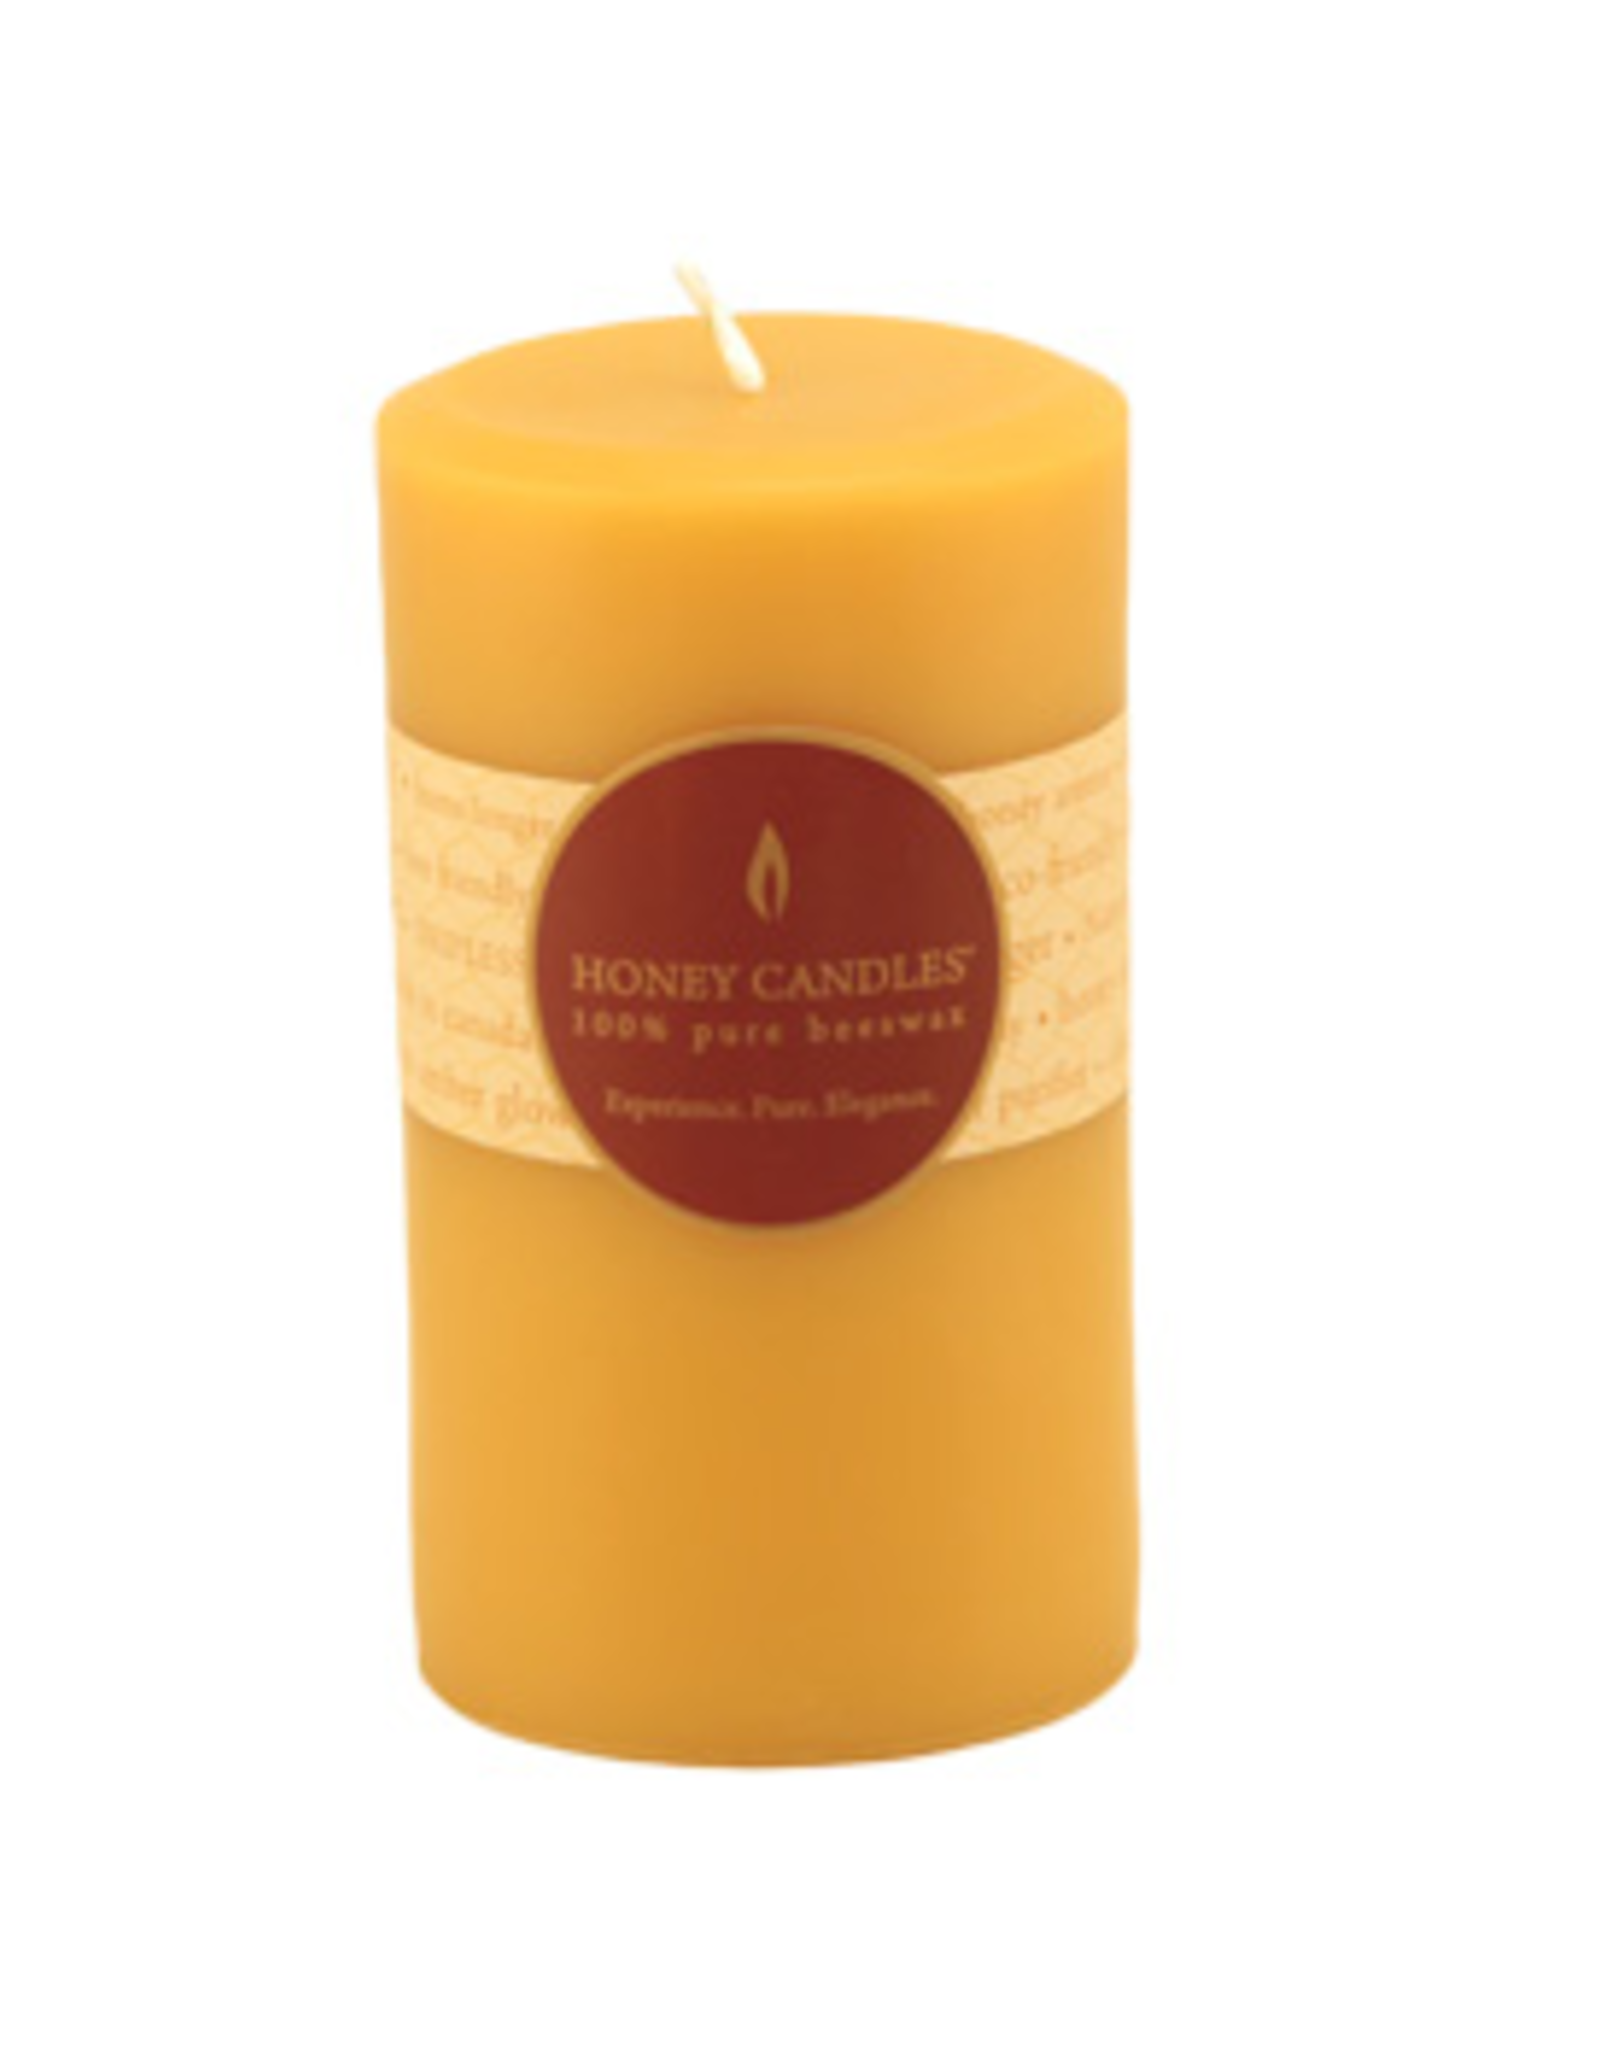 "Honey Candles Honey Candles 5"" Round Pillar-Natural"